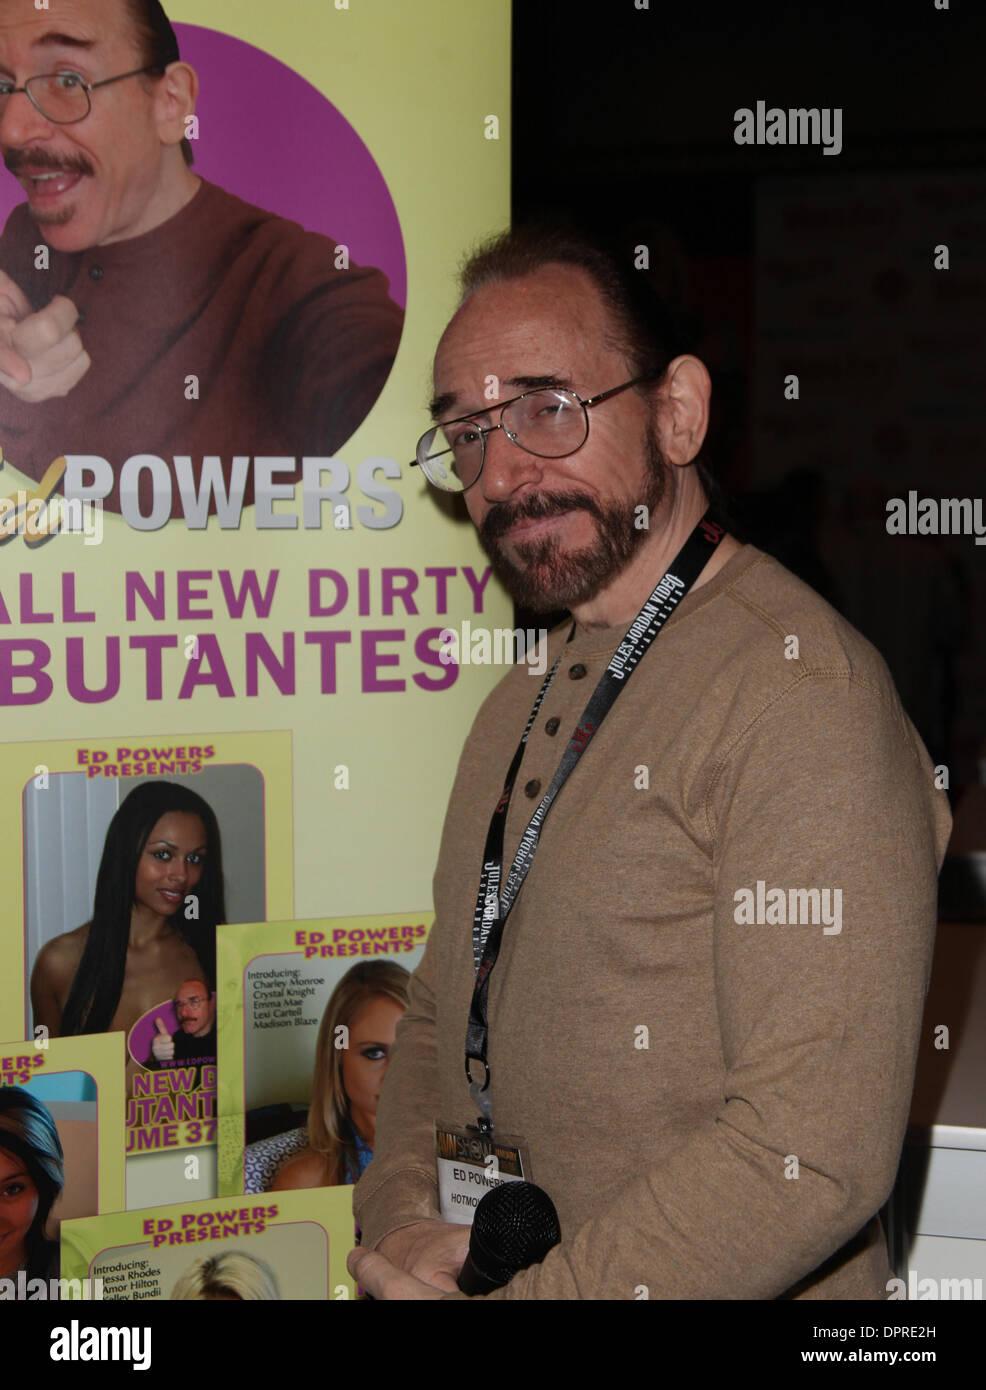 Adult film job openings